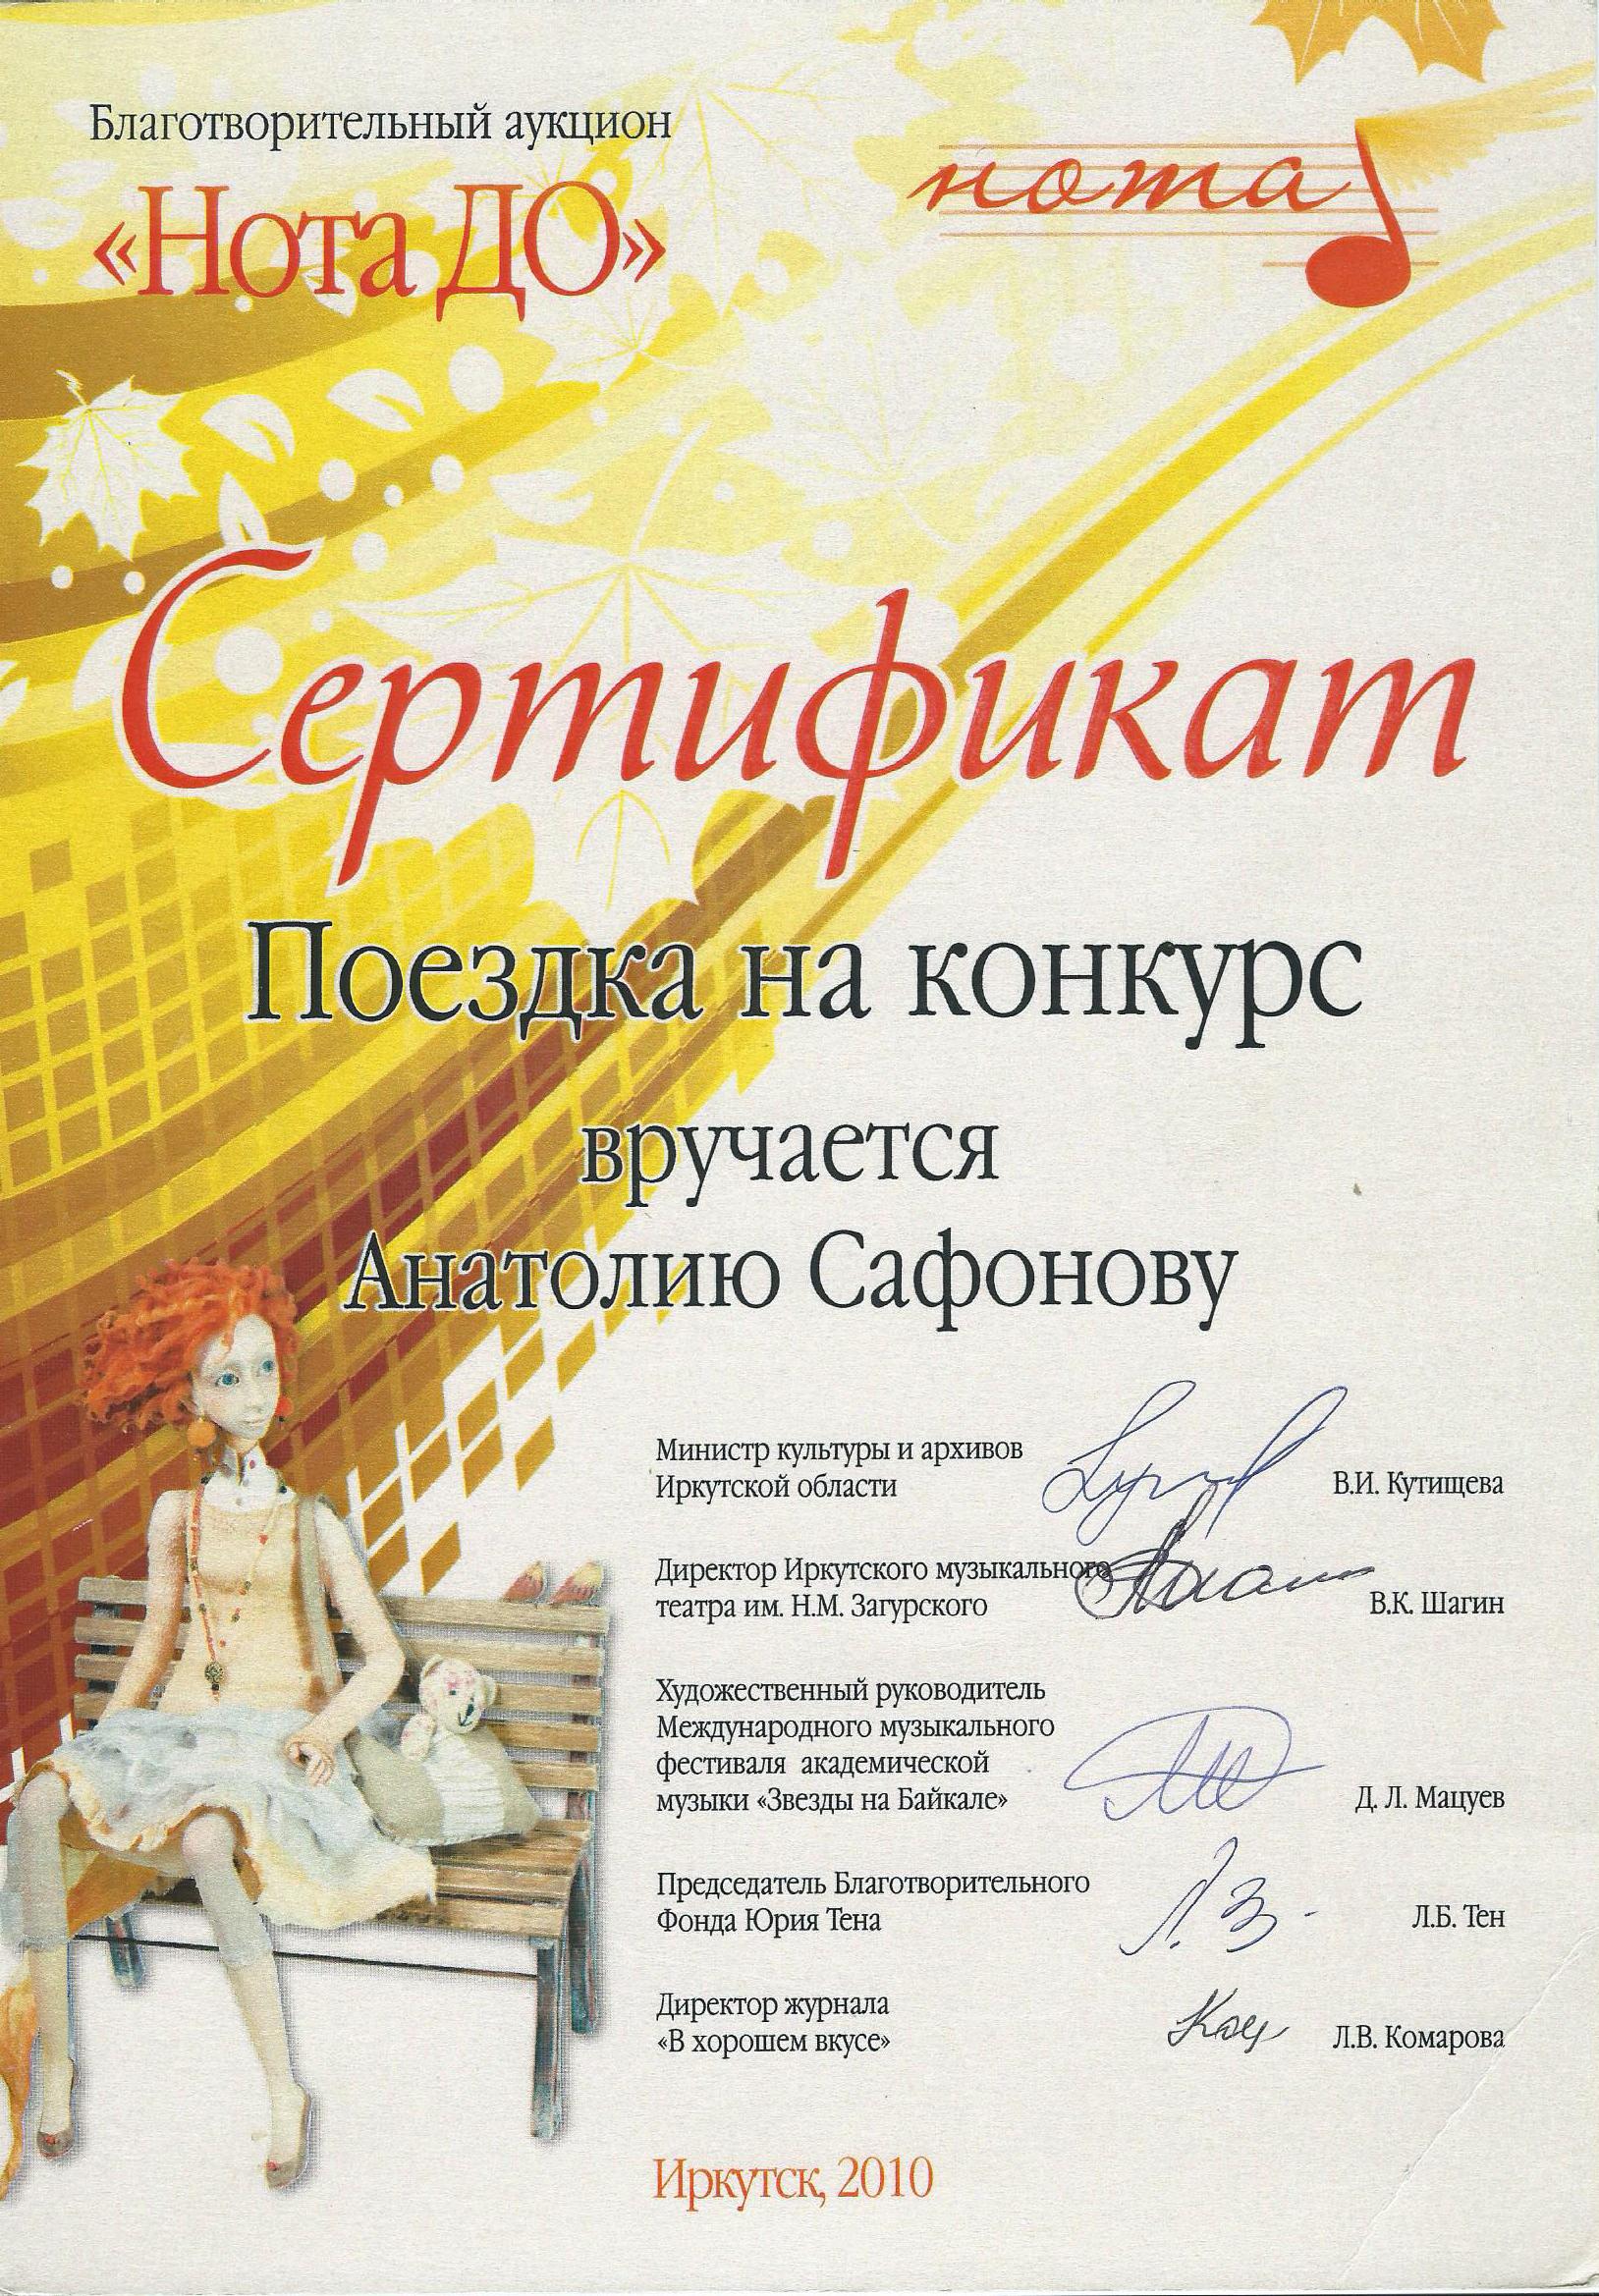 СЕРТИФИКАТ 2011